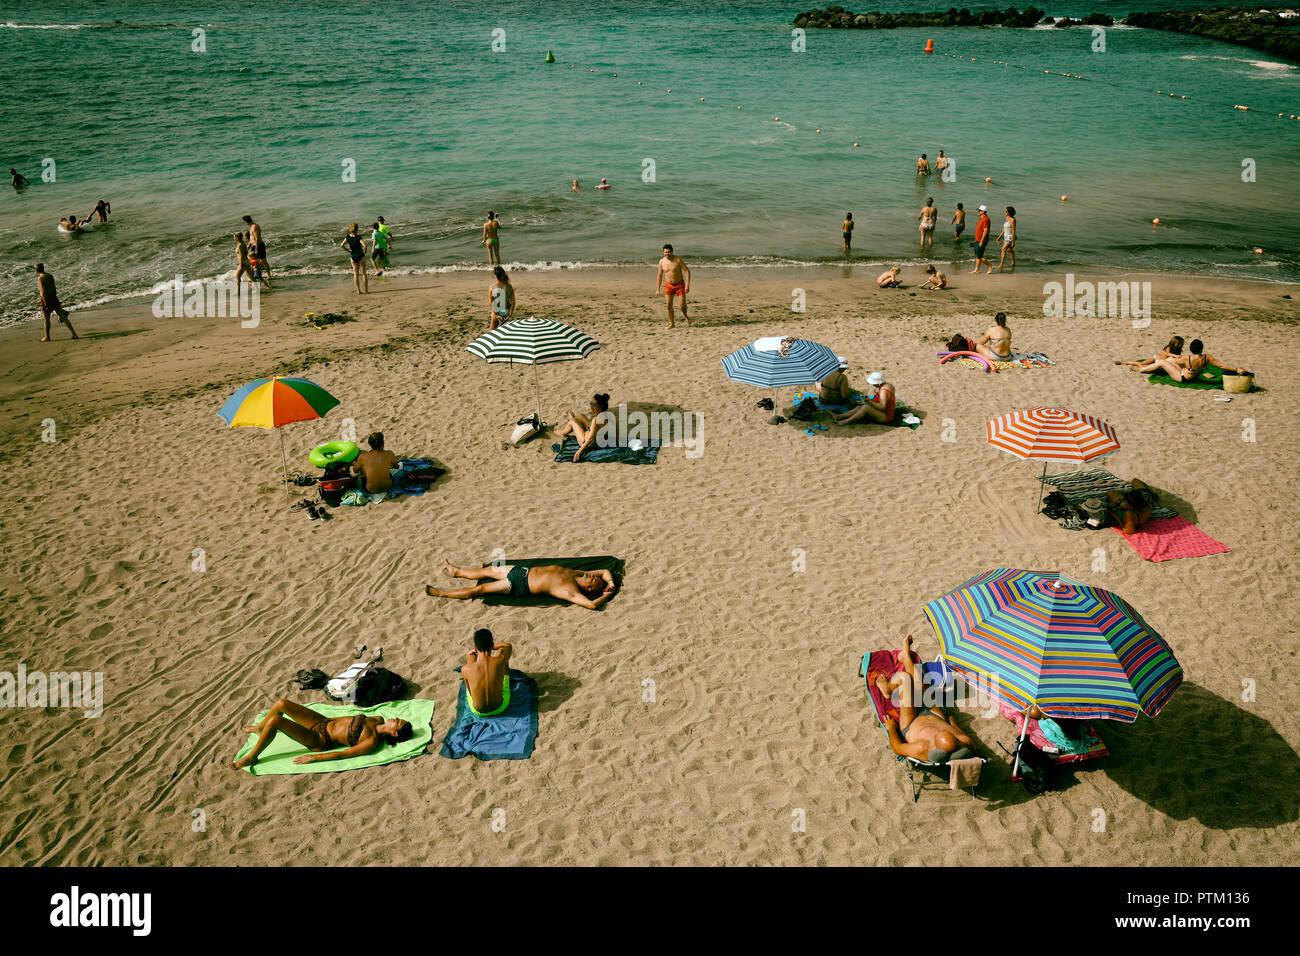 Holidaymakers sunbathe on the beach, Torviscas, Playa El Duque, Costa Adeje, Tenerife, Canary Islands, Spain - Stock Image